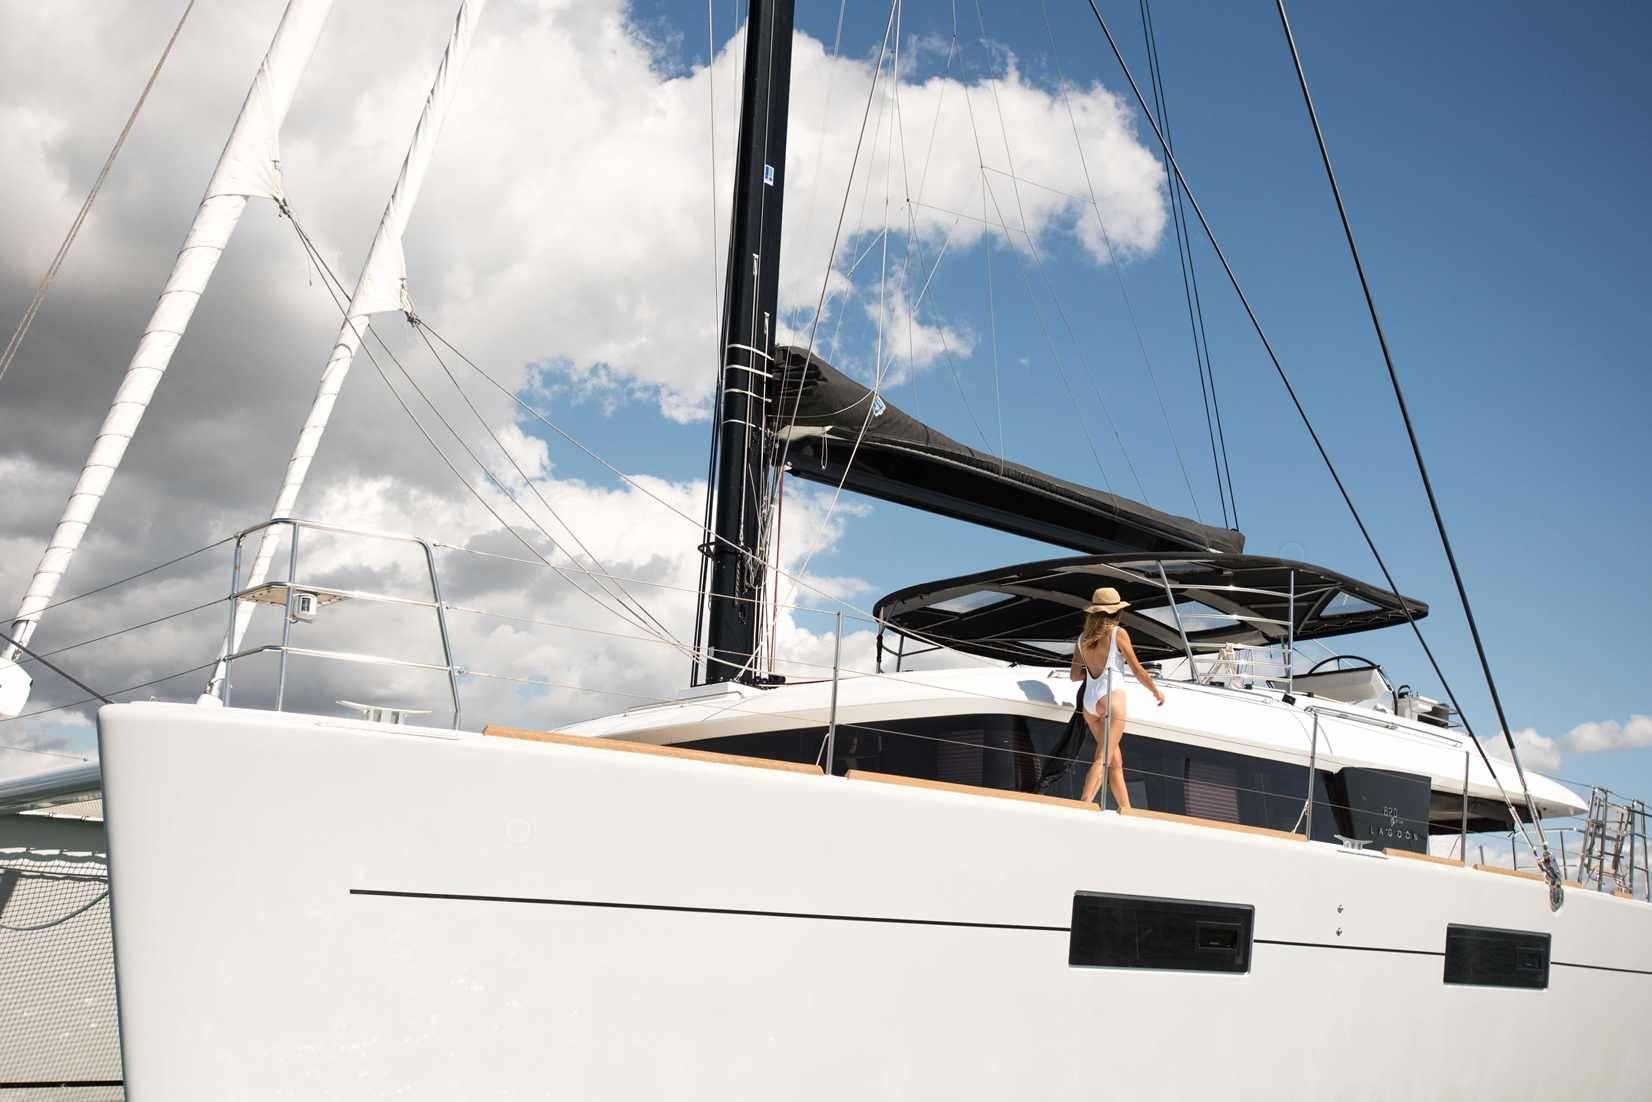 Catamaran Soleanis II